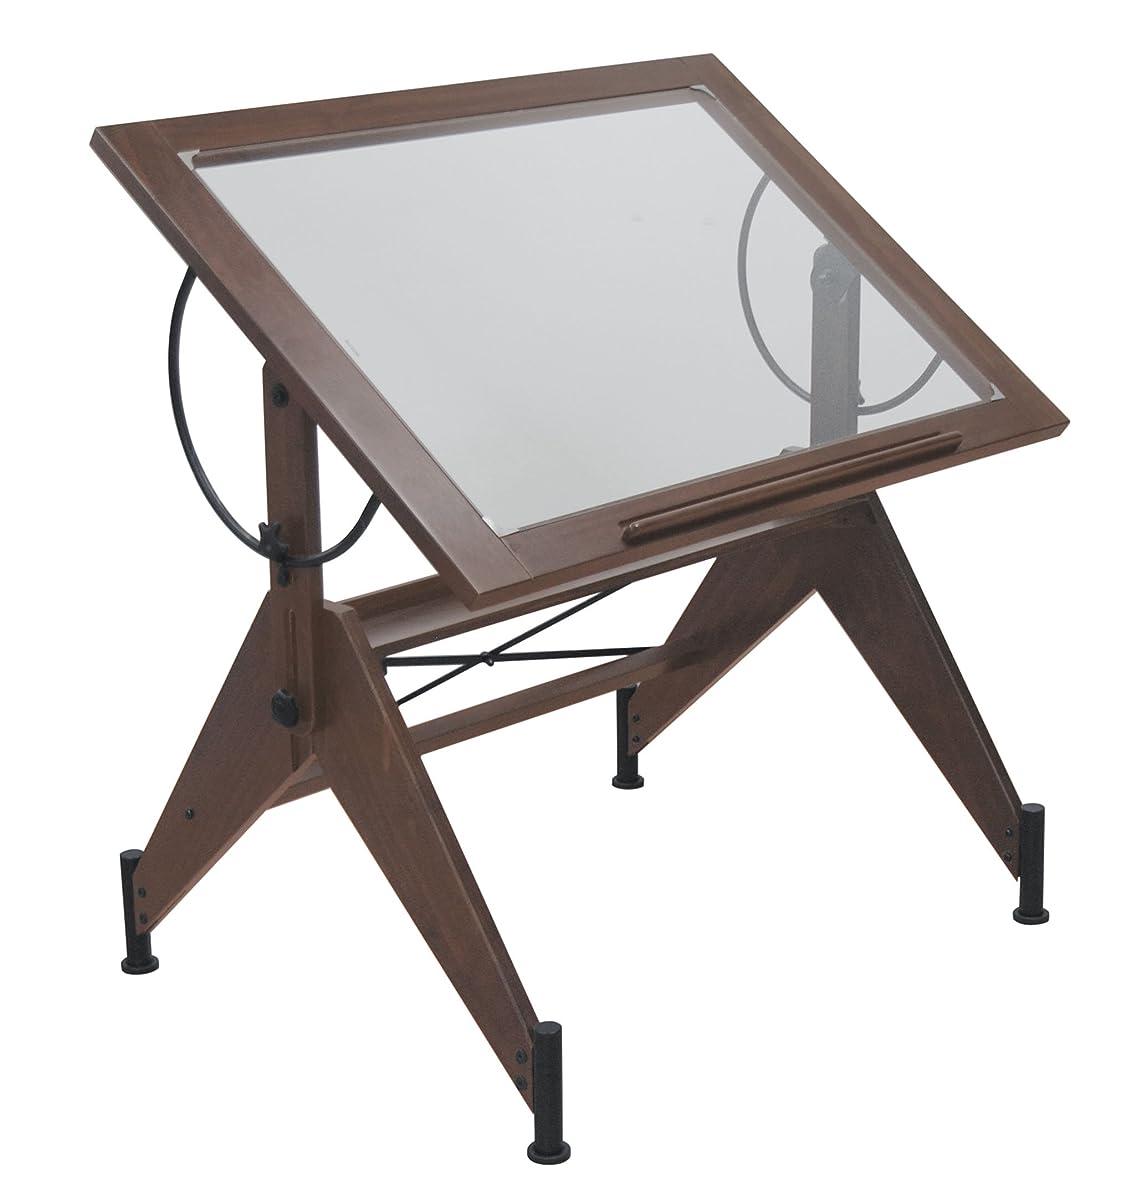 STUDIO DESIGNS Aries Glass Top Drafting Table Sonoma Dark Walnut Brown/Clear Glass 13310